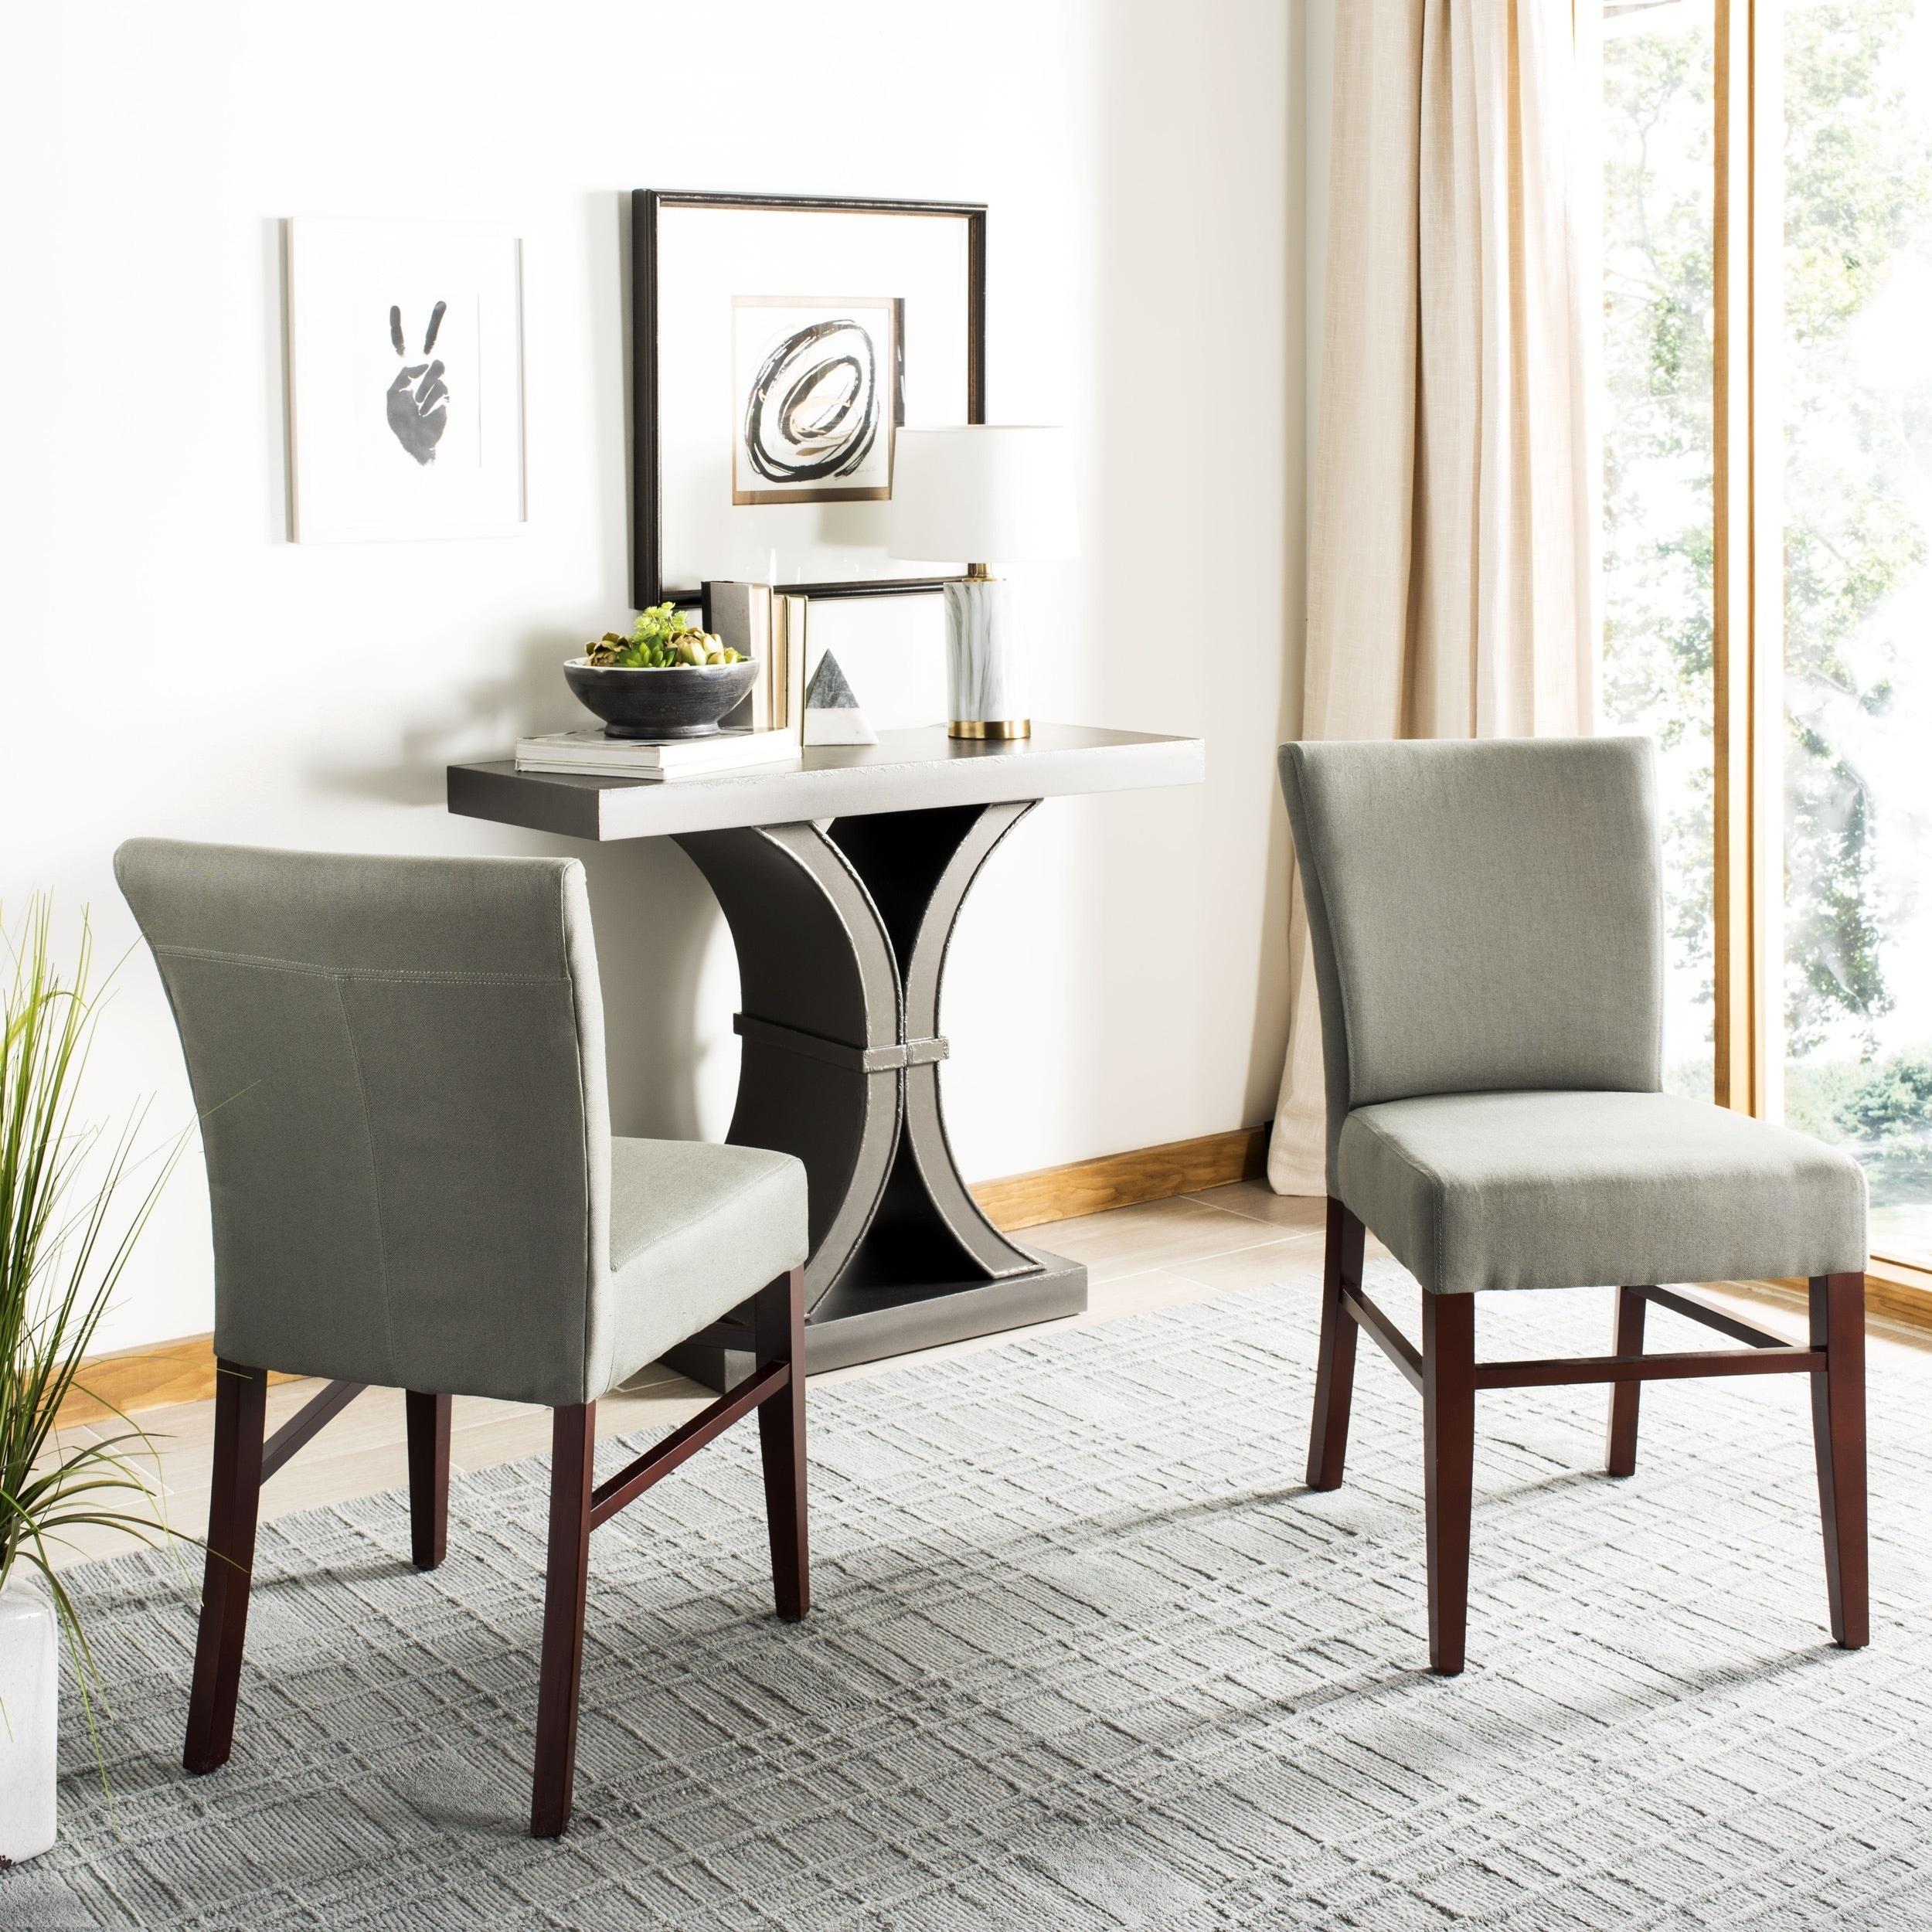 Strange Safavieh Dining Parsons Bolton Grey Green Linen Dining Chairs Set Of 2 Ncnpc Chair Design For Home Ncnpcorg